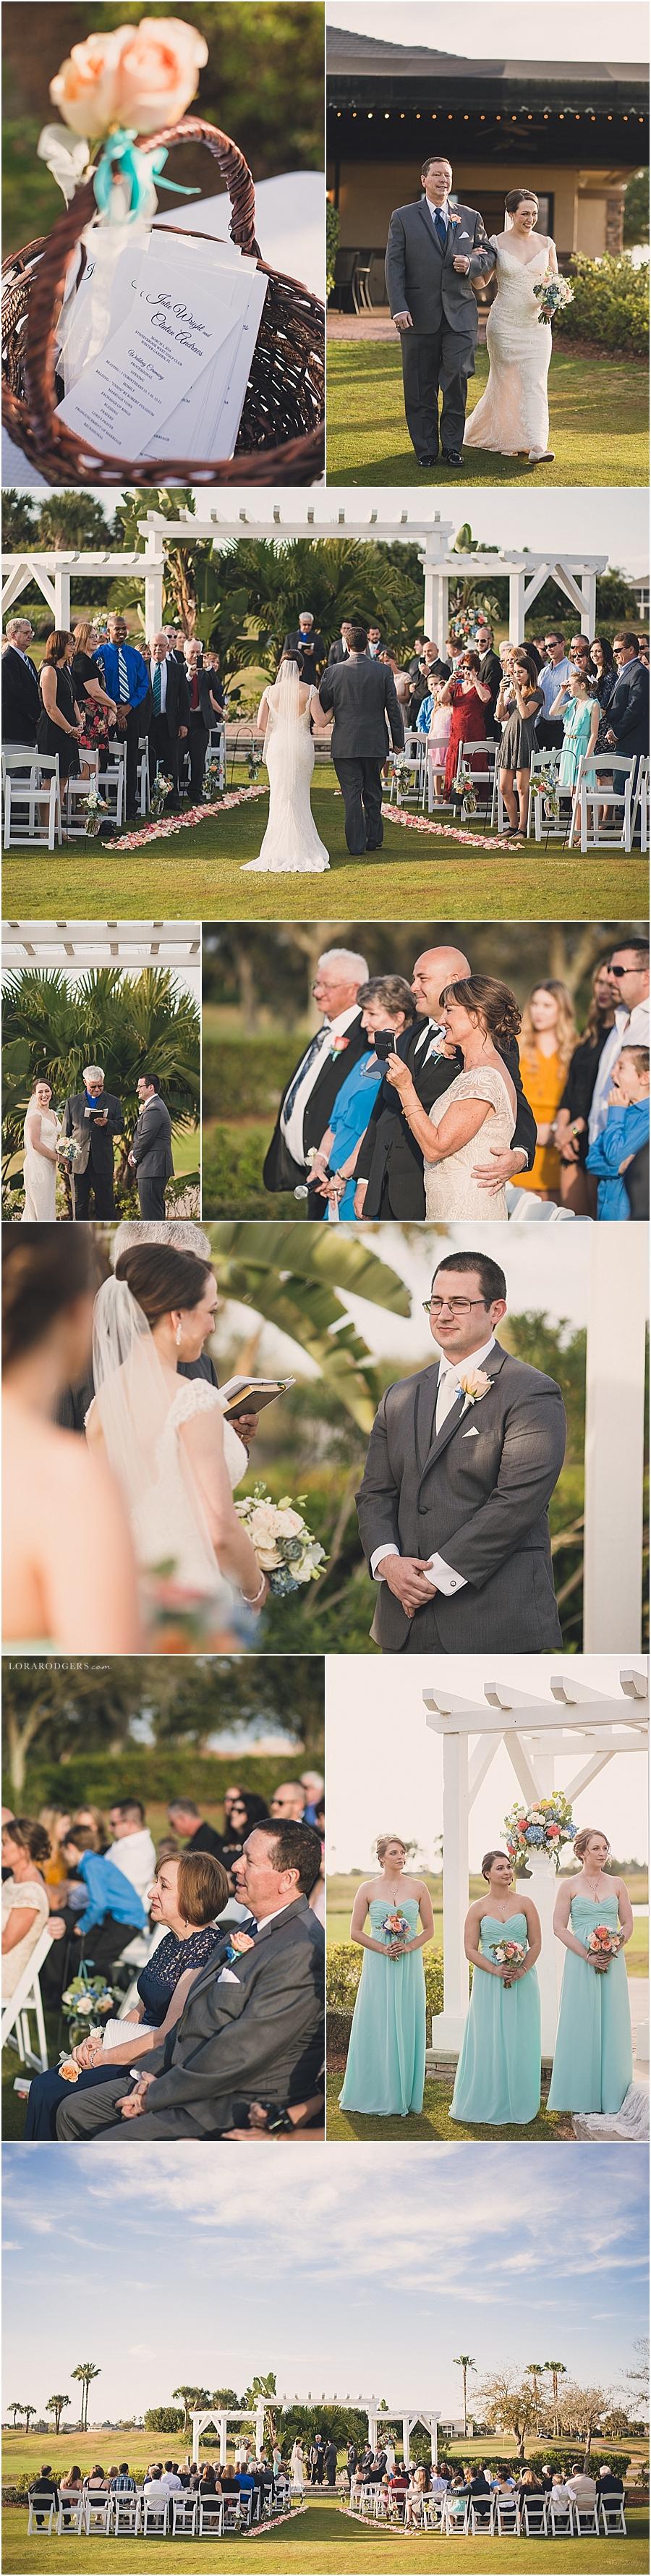 Stoneybrook_West_Orlando_Florida_Wedding_010